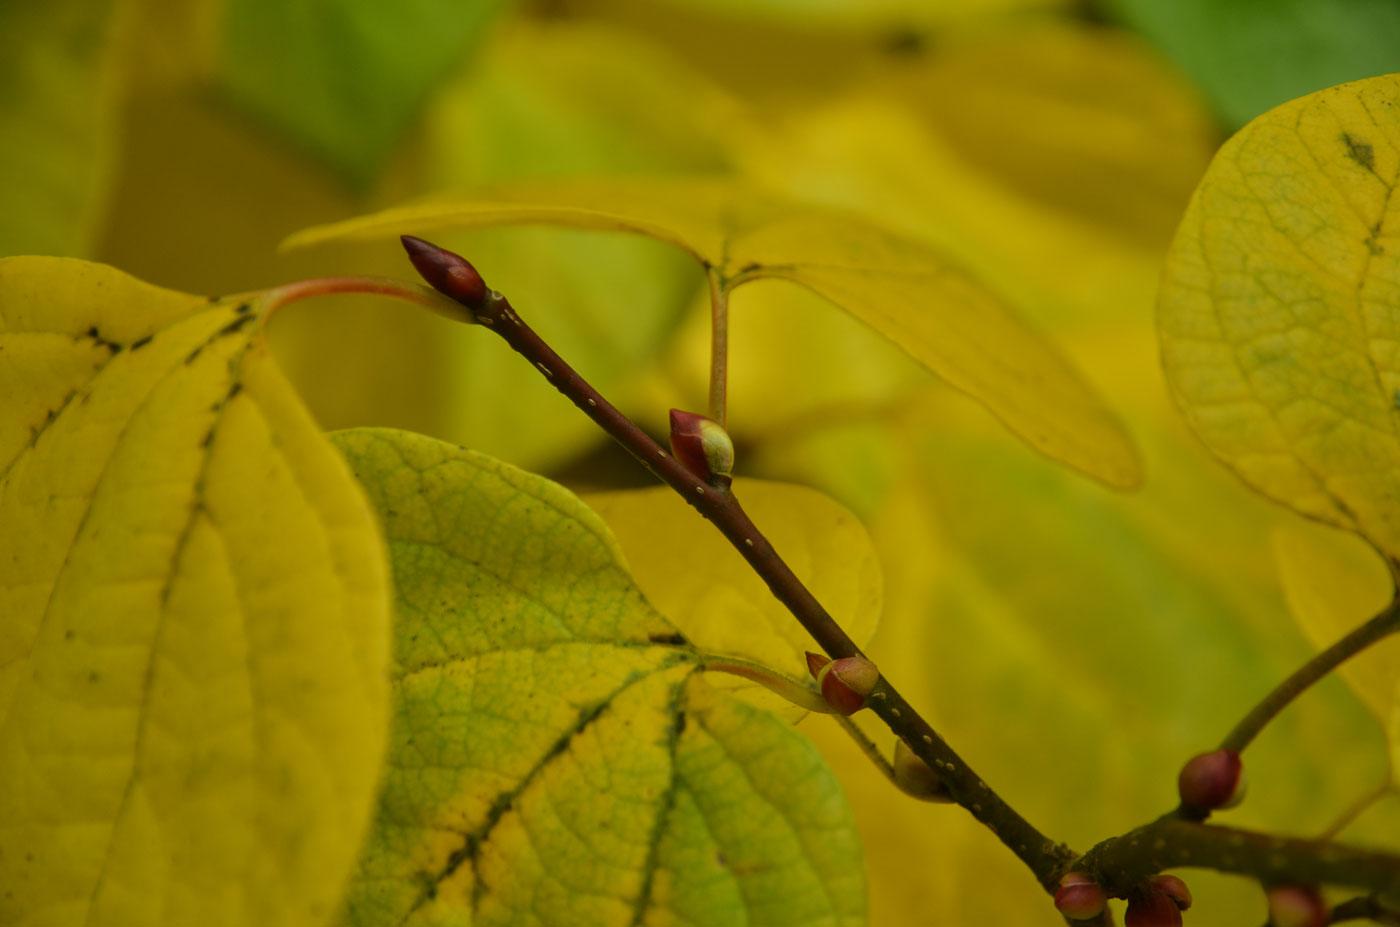 Budding twigs of <i>Lindera obtusiloba</i> at Wespelaar Arboretum